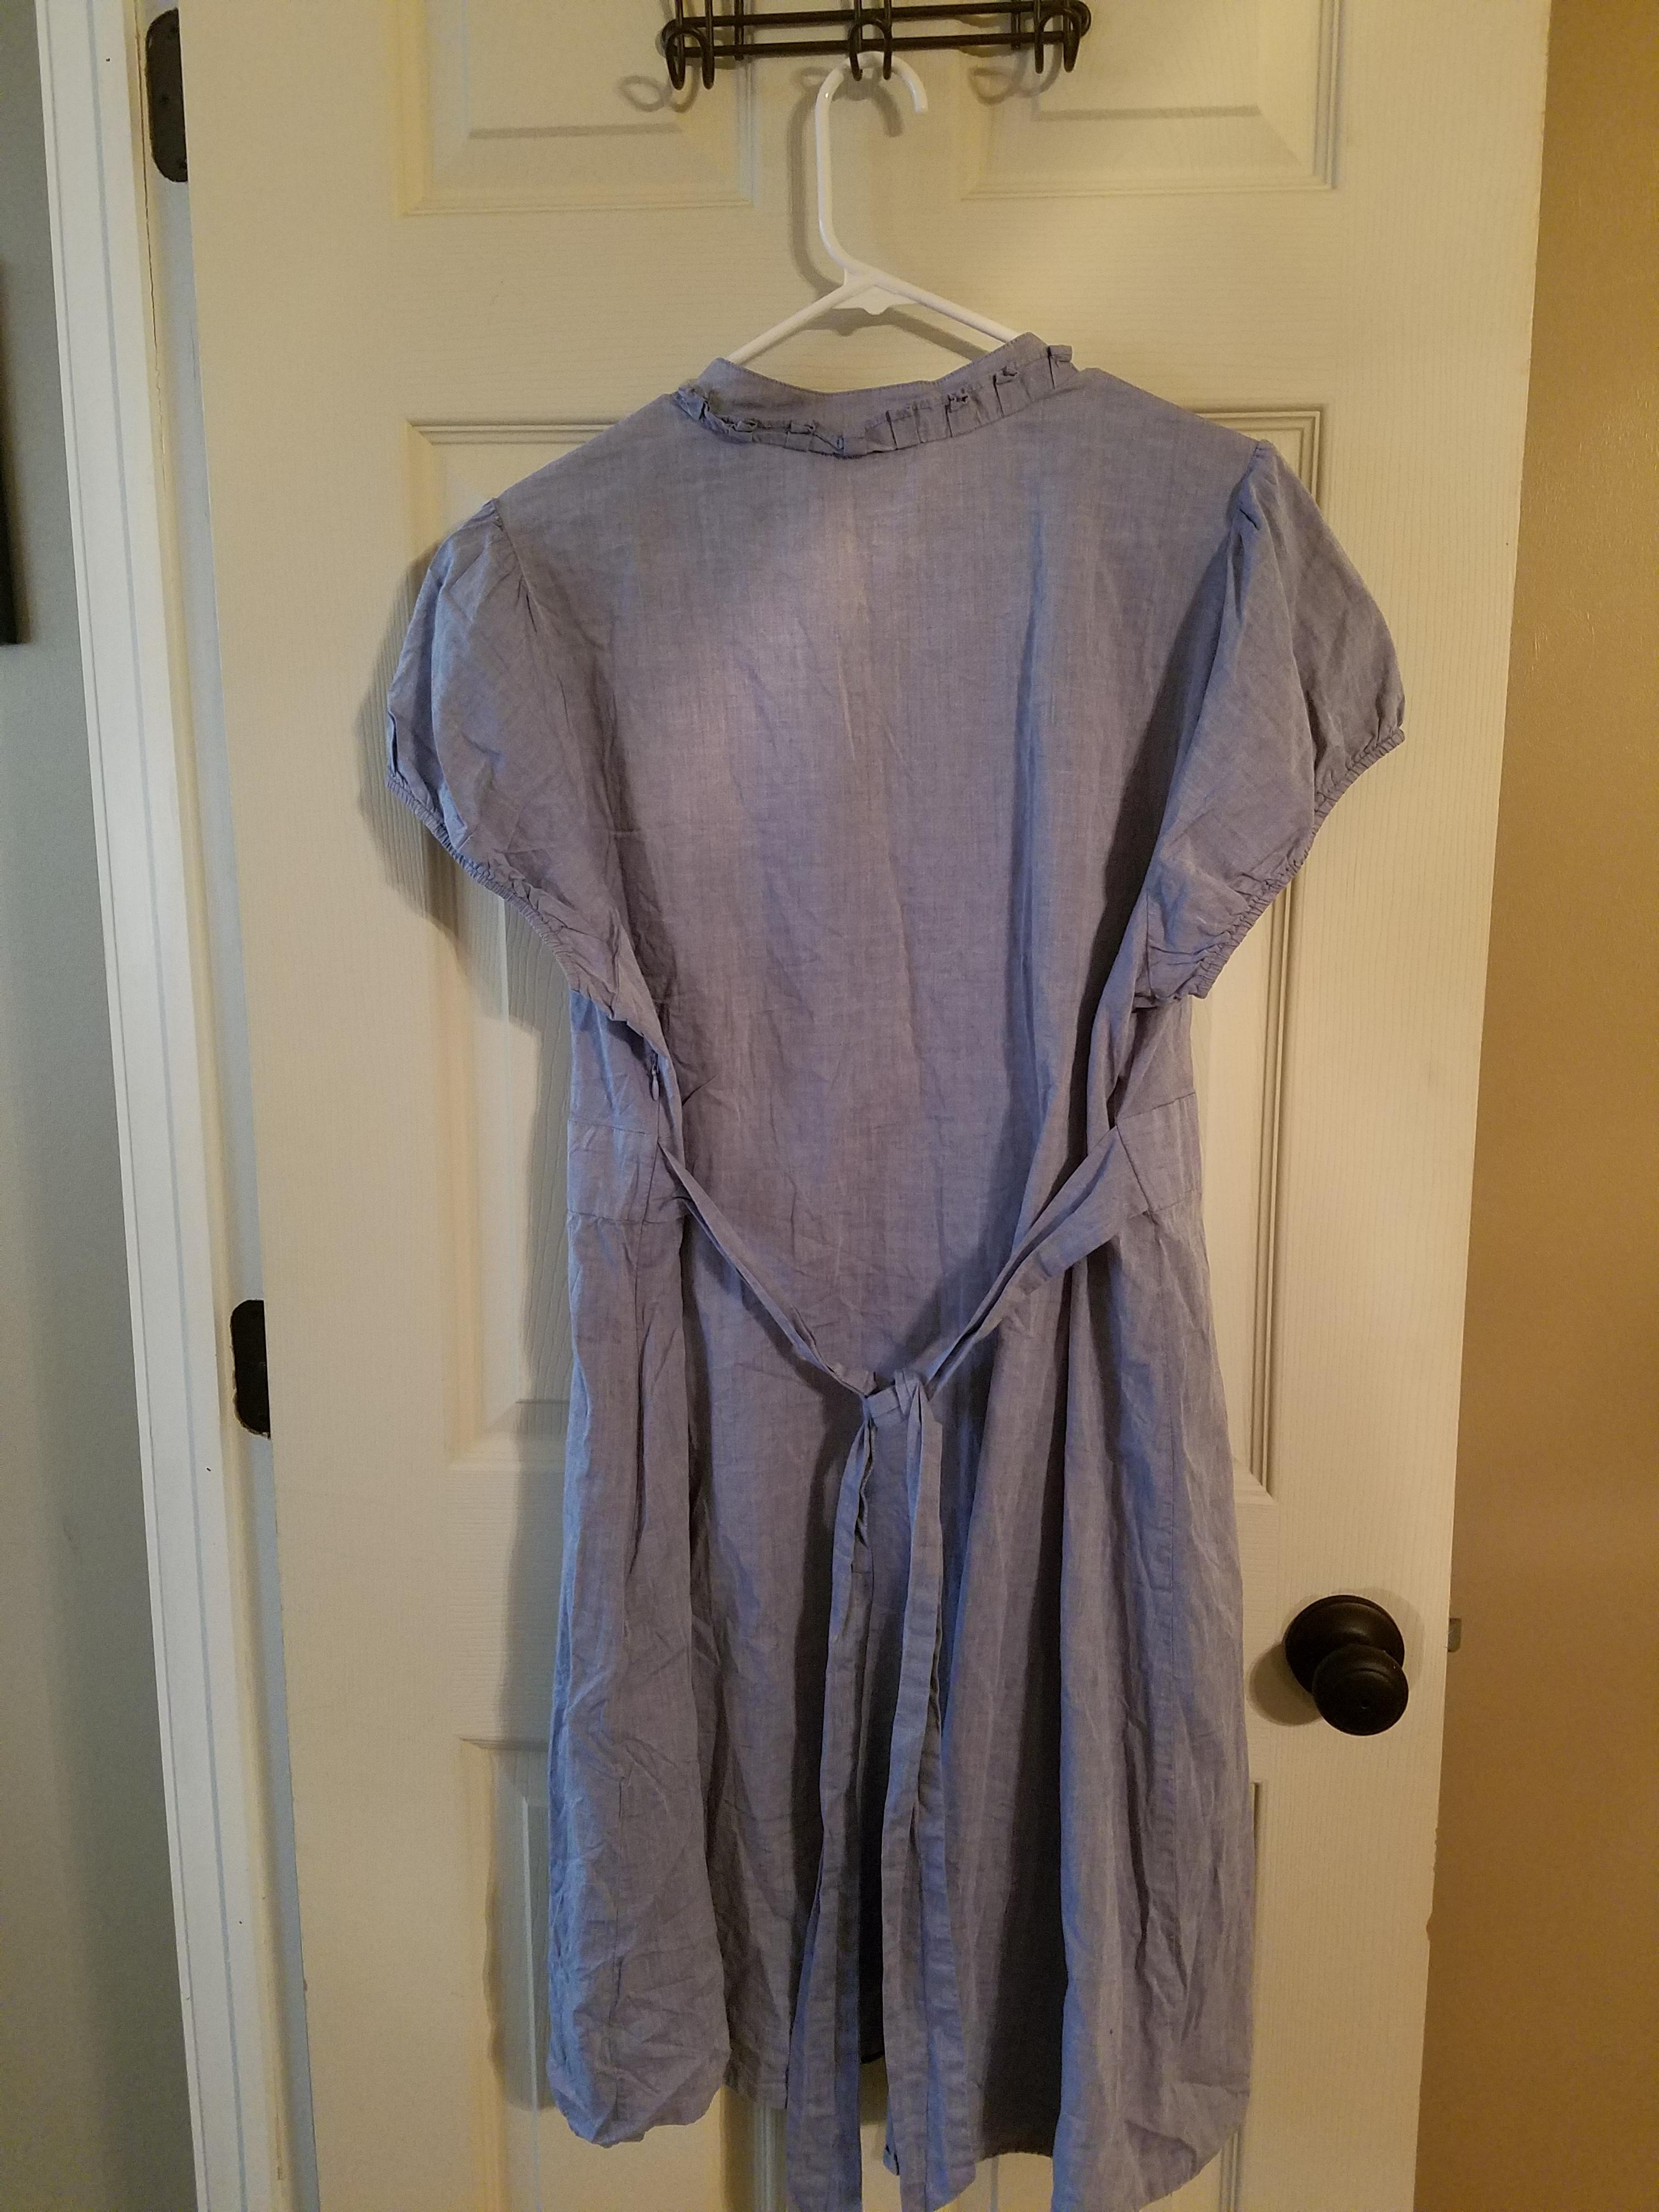 Plus size clothing swap online